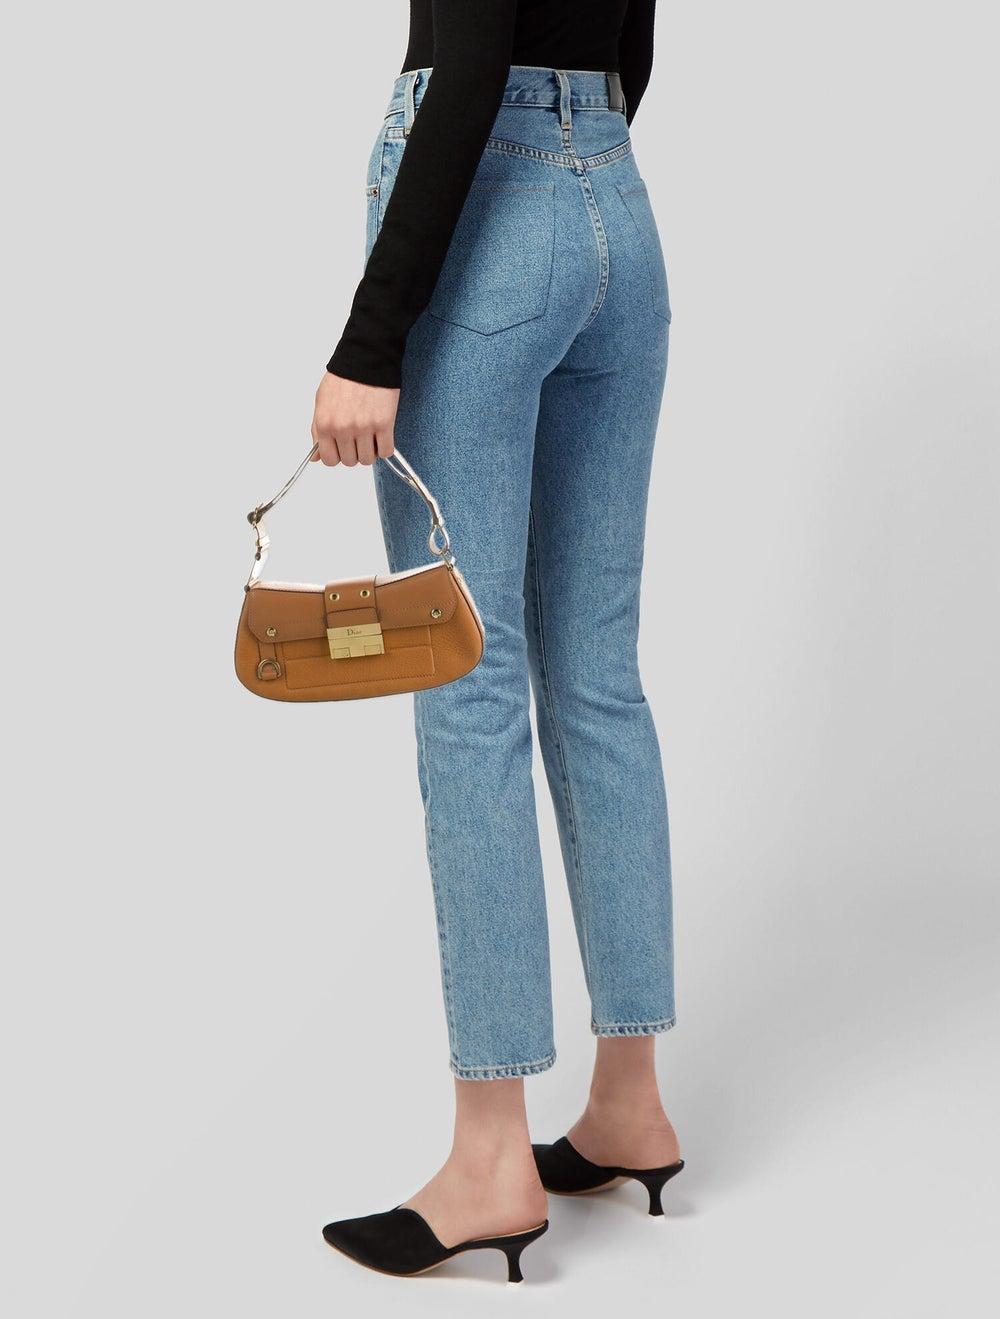 Christian Dior Street Chic Columbus Bag Gold - image 2